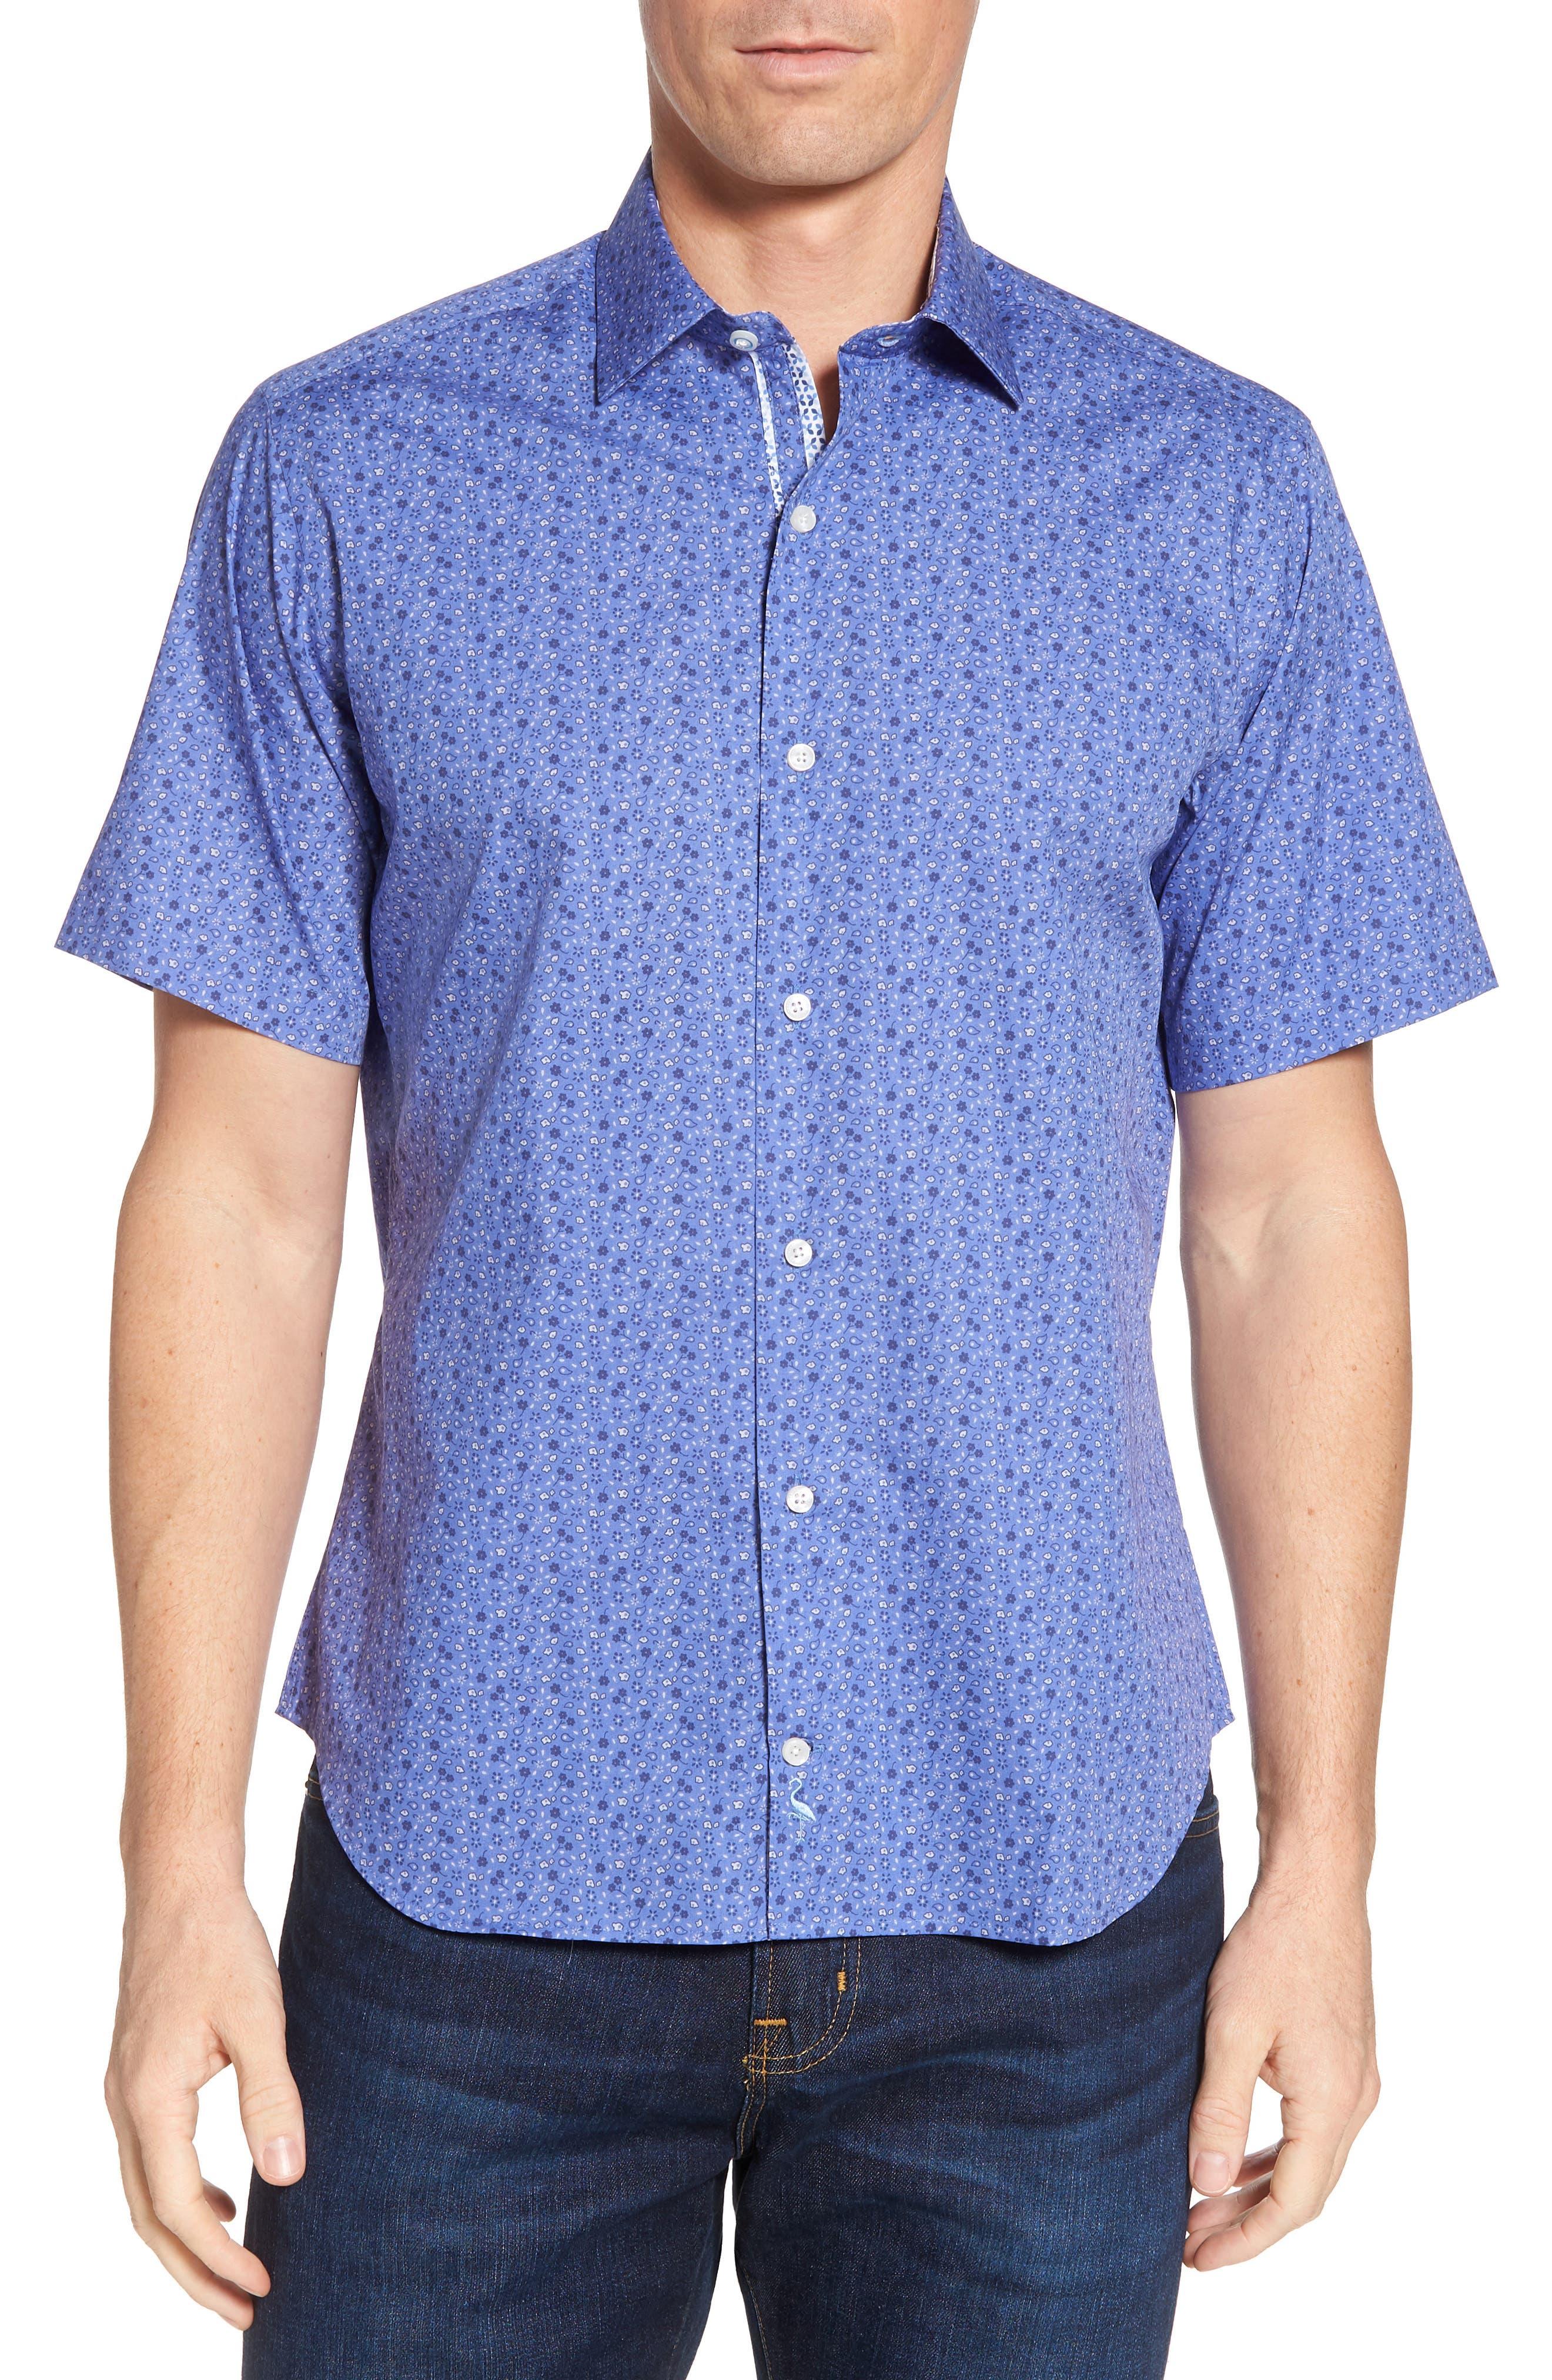 TailorByrd Ballou Regular Fit Floral Print Sport Shirt